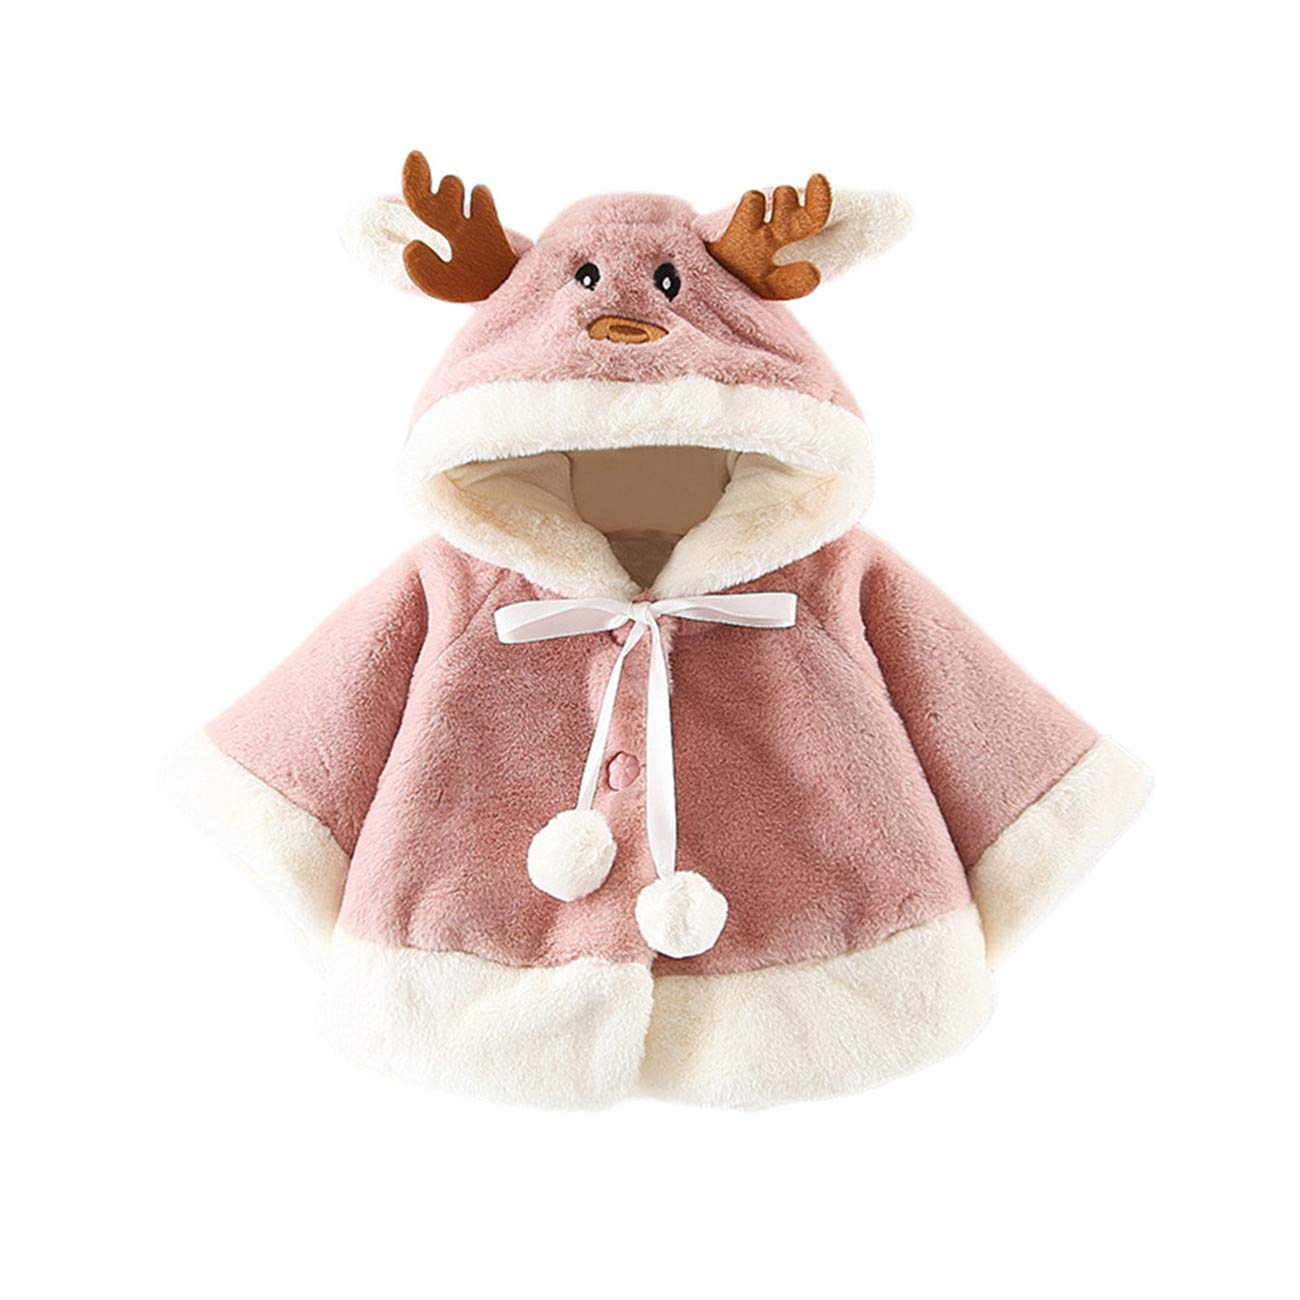 HCFKJ Ropa Bebe Ni/ñA Invierno Ni/ñO Manga Larga Camisetas Beb Conjuntos Moda Navidad Disfraz Ciervo Encapuchado Capa Capa Bata Ni/ñOs Ni/ñAsrajes